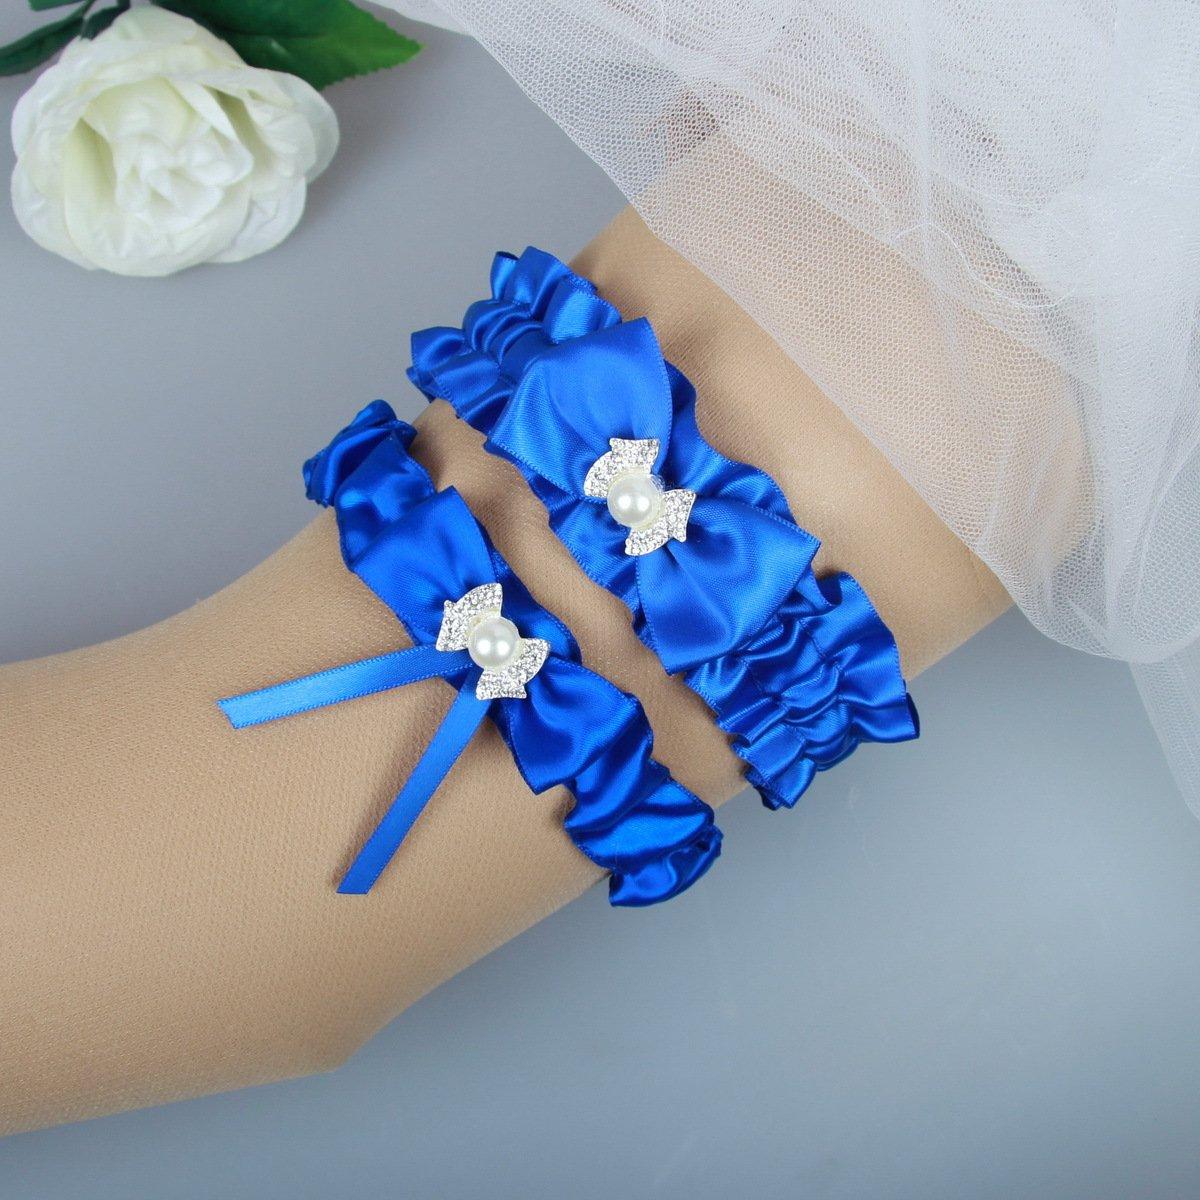 Plus Size Wedding Garters: MerryJuly Royal Blue Wedding Bridal Garter Belt Set Plus